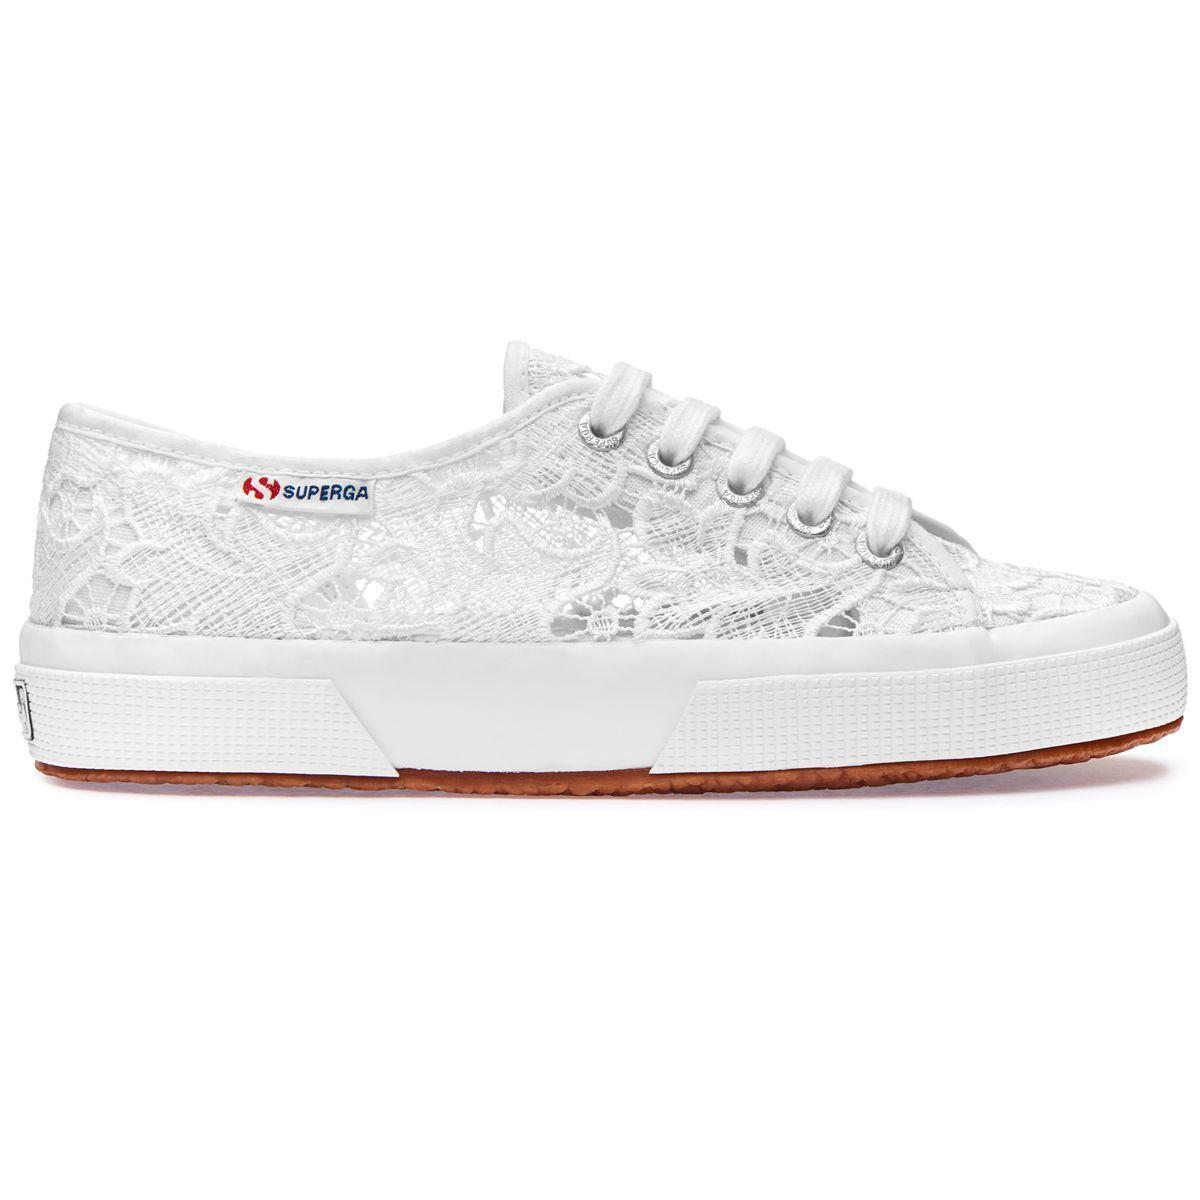 SUPERGA 2750 BIANCO PIZZO MACRAME S008YA0  - white sneakers